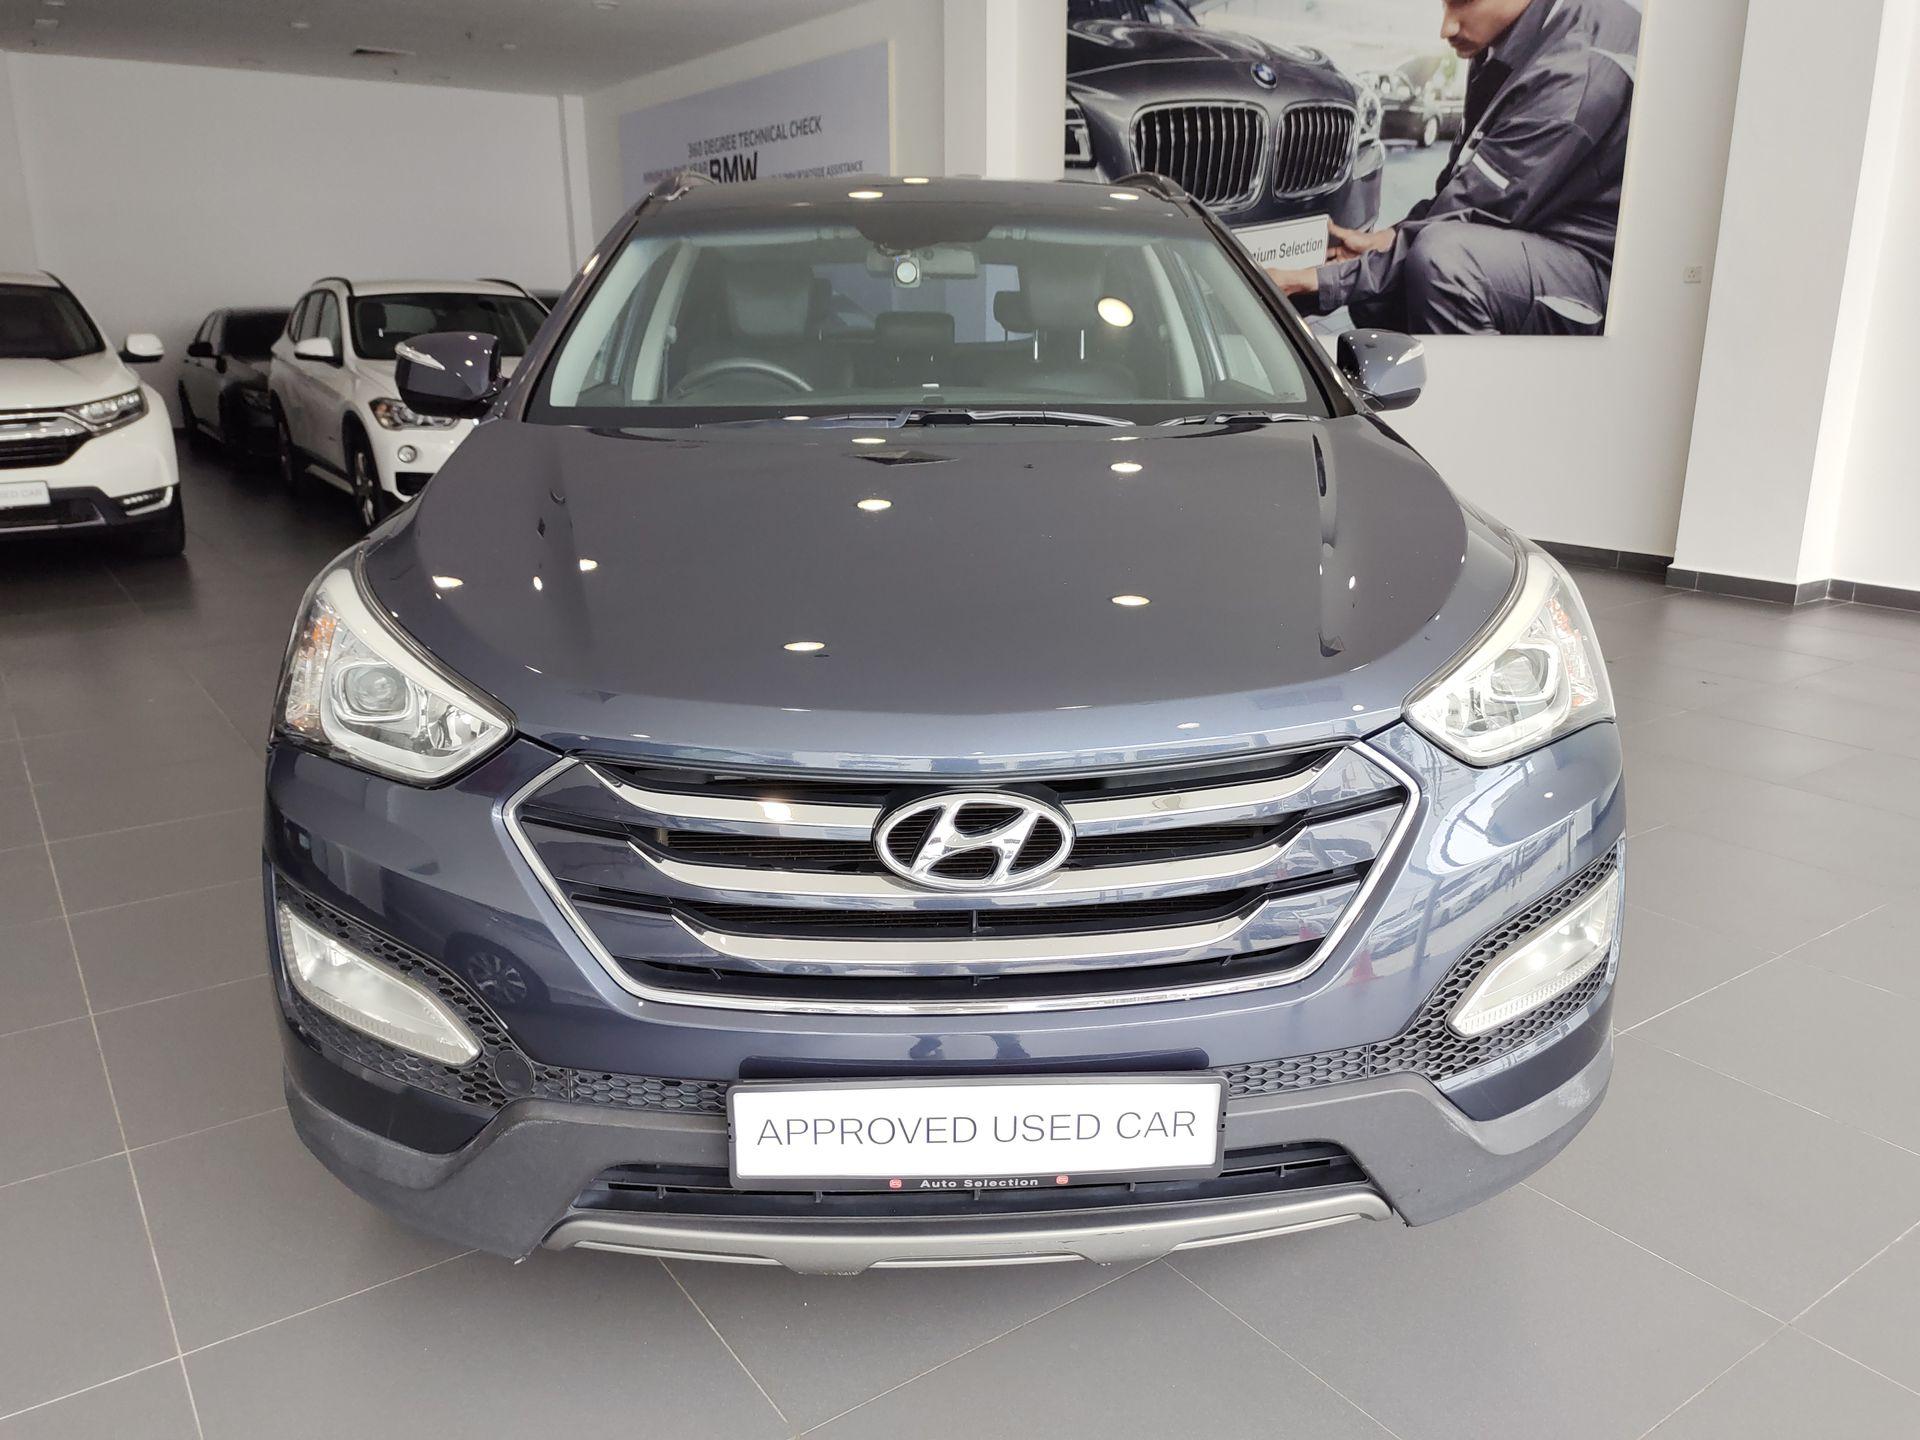 2013 Hyundai Santa Fe 2.4 G 6AT